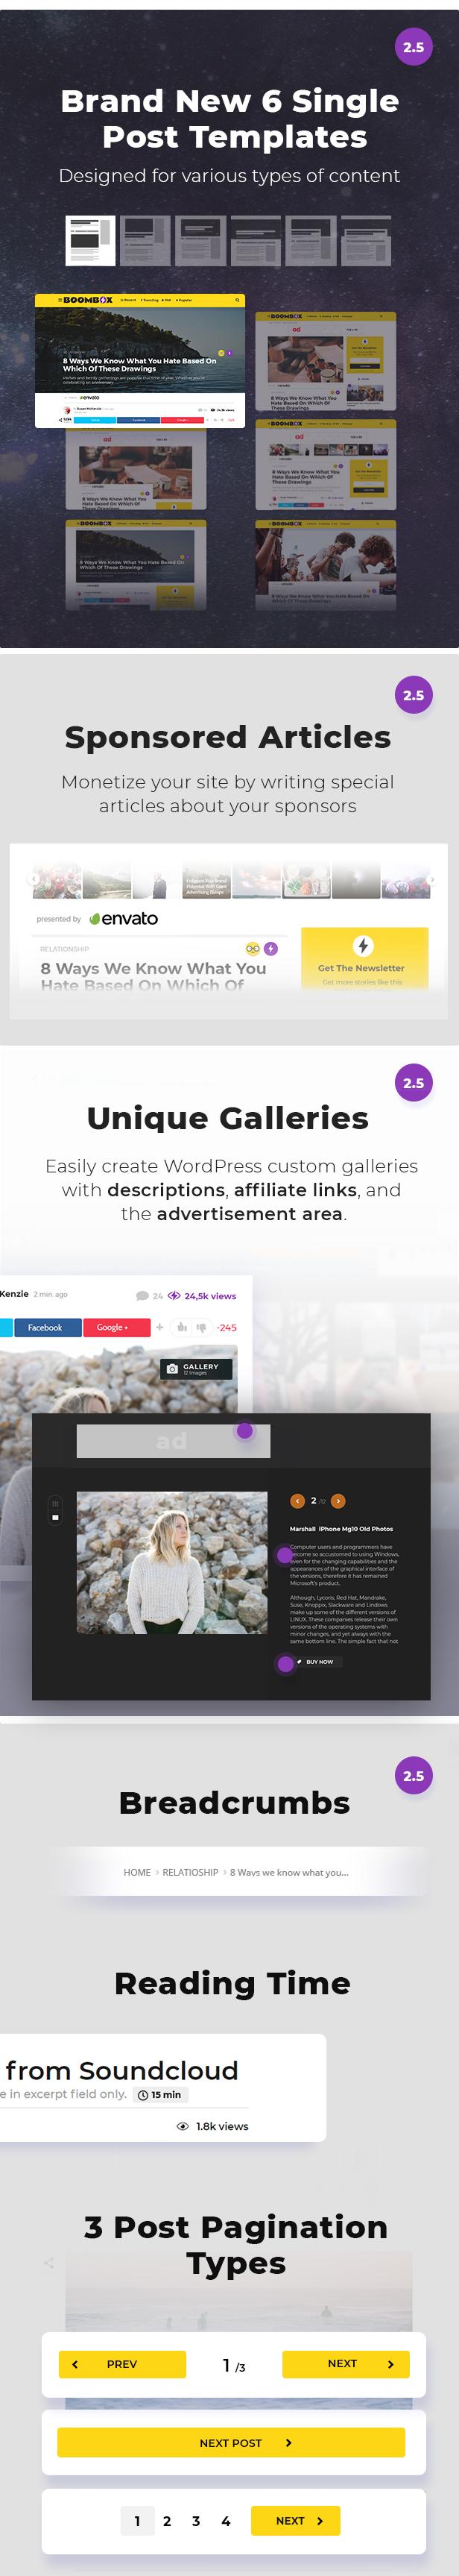 boombox v2.5 - BoomBox — Viral Magazine WordPress Theme